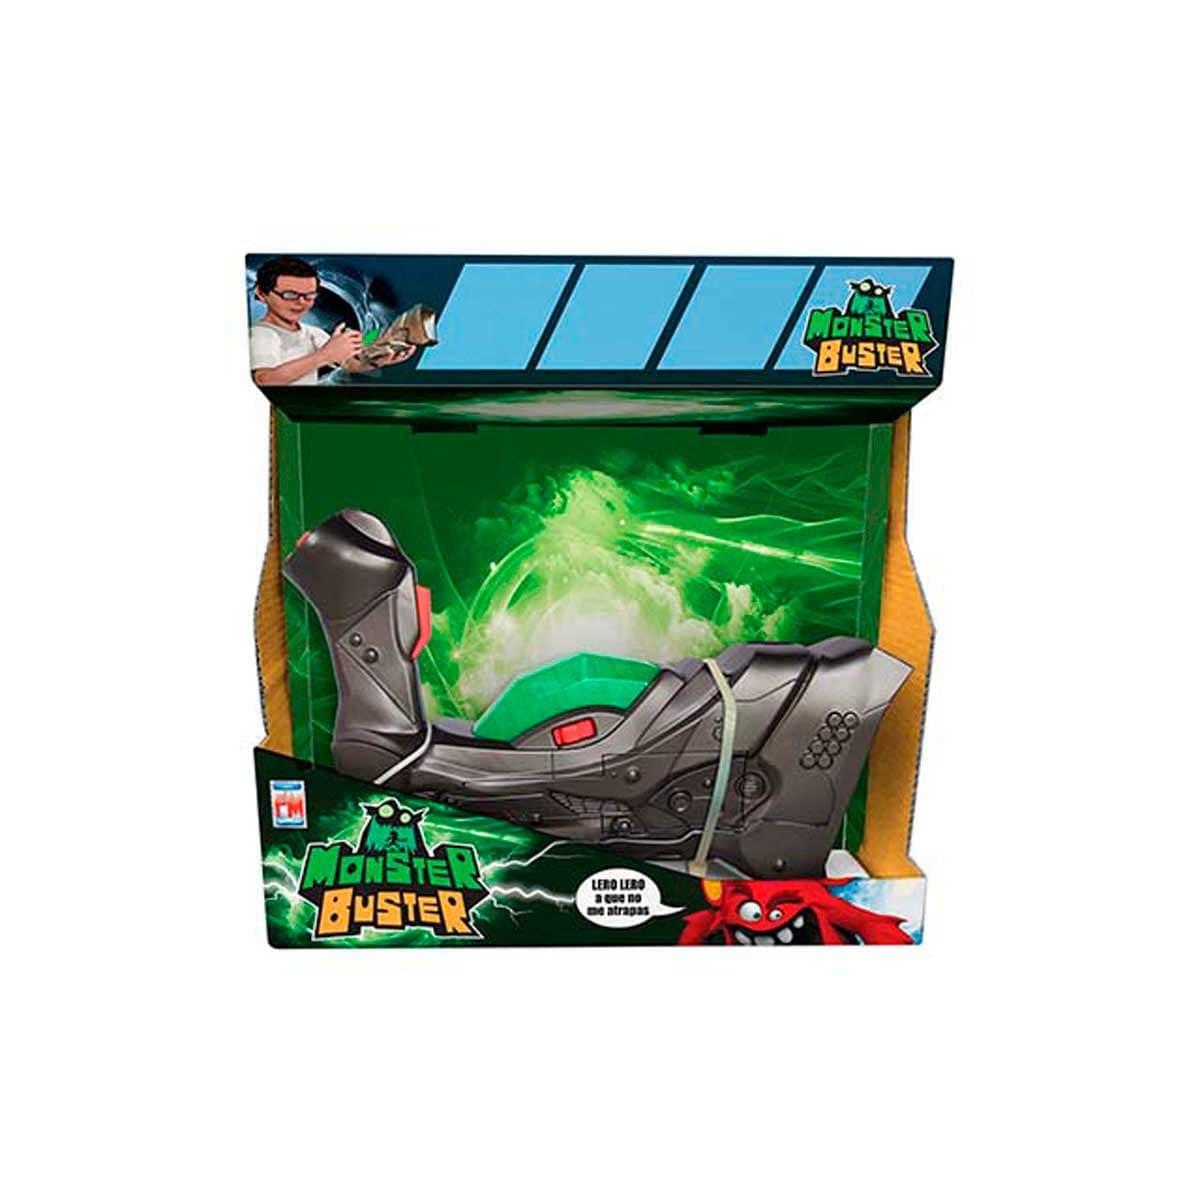 Juego de Mesa Monster Booster Fotorama